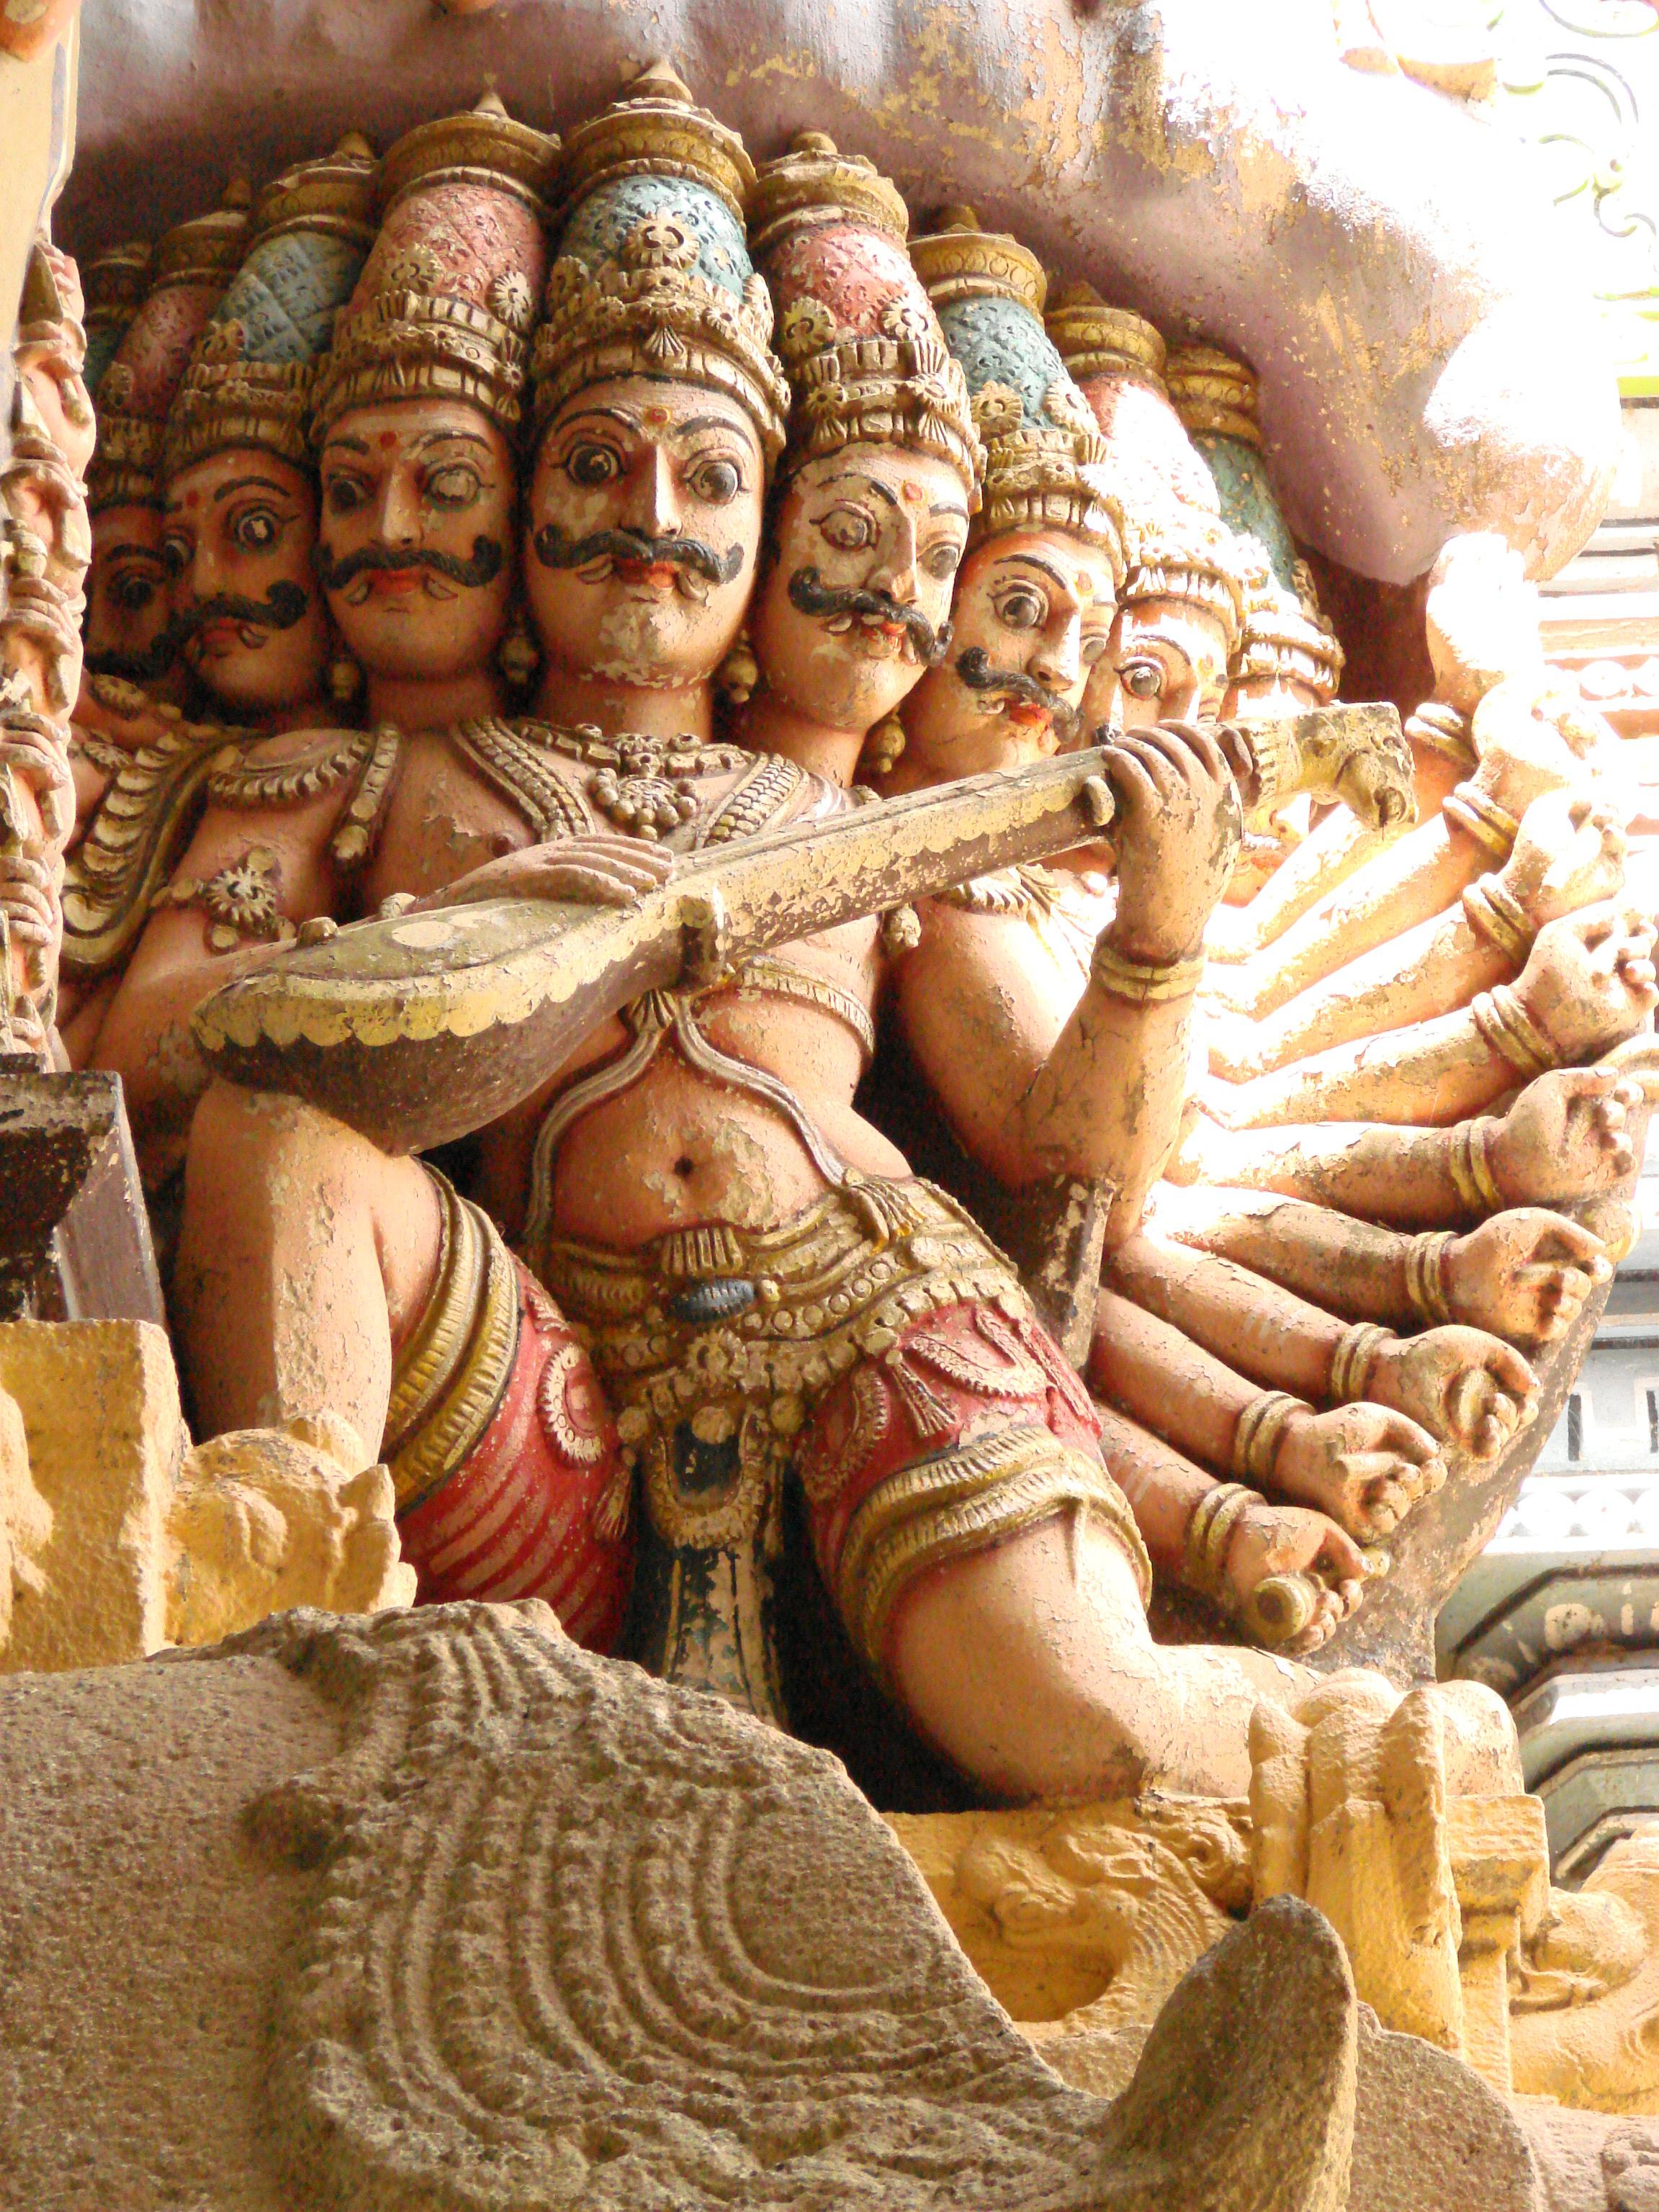 Indijsko vajarstvo - Page 2 Sculptures_-_Ivory_Sculpture_-_Sri_Meenakshi-Sundareshwarar_Temple_-_Madurai_-_India